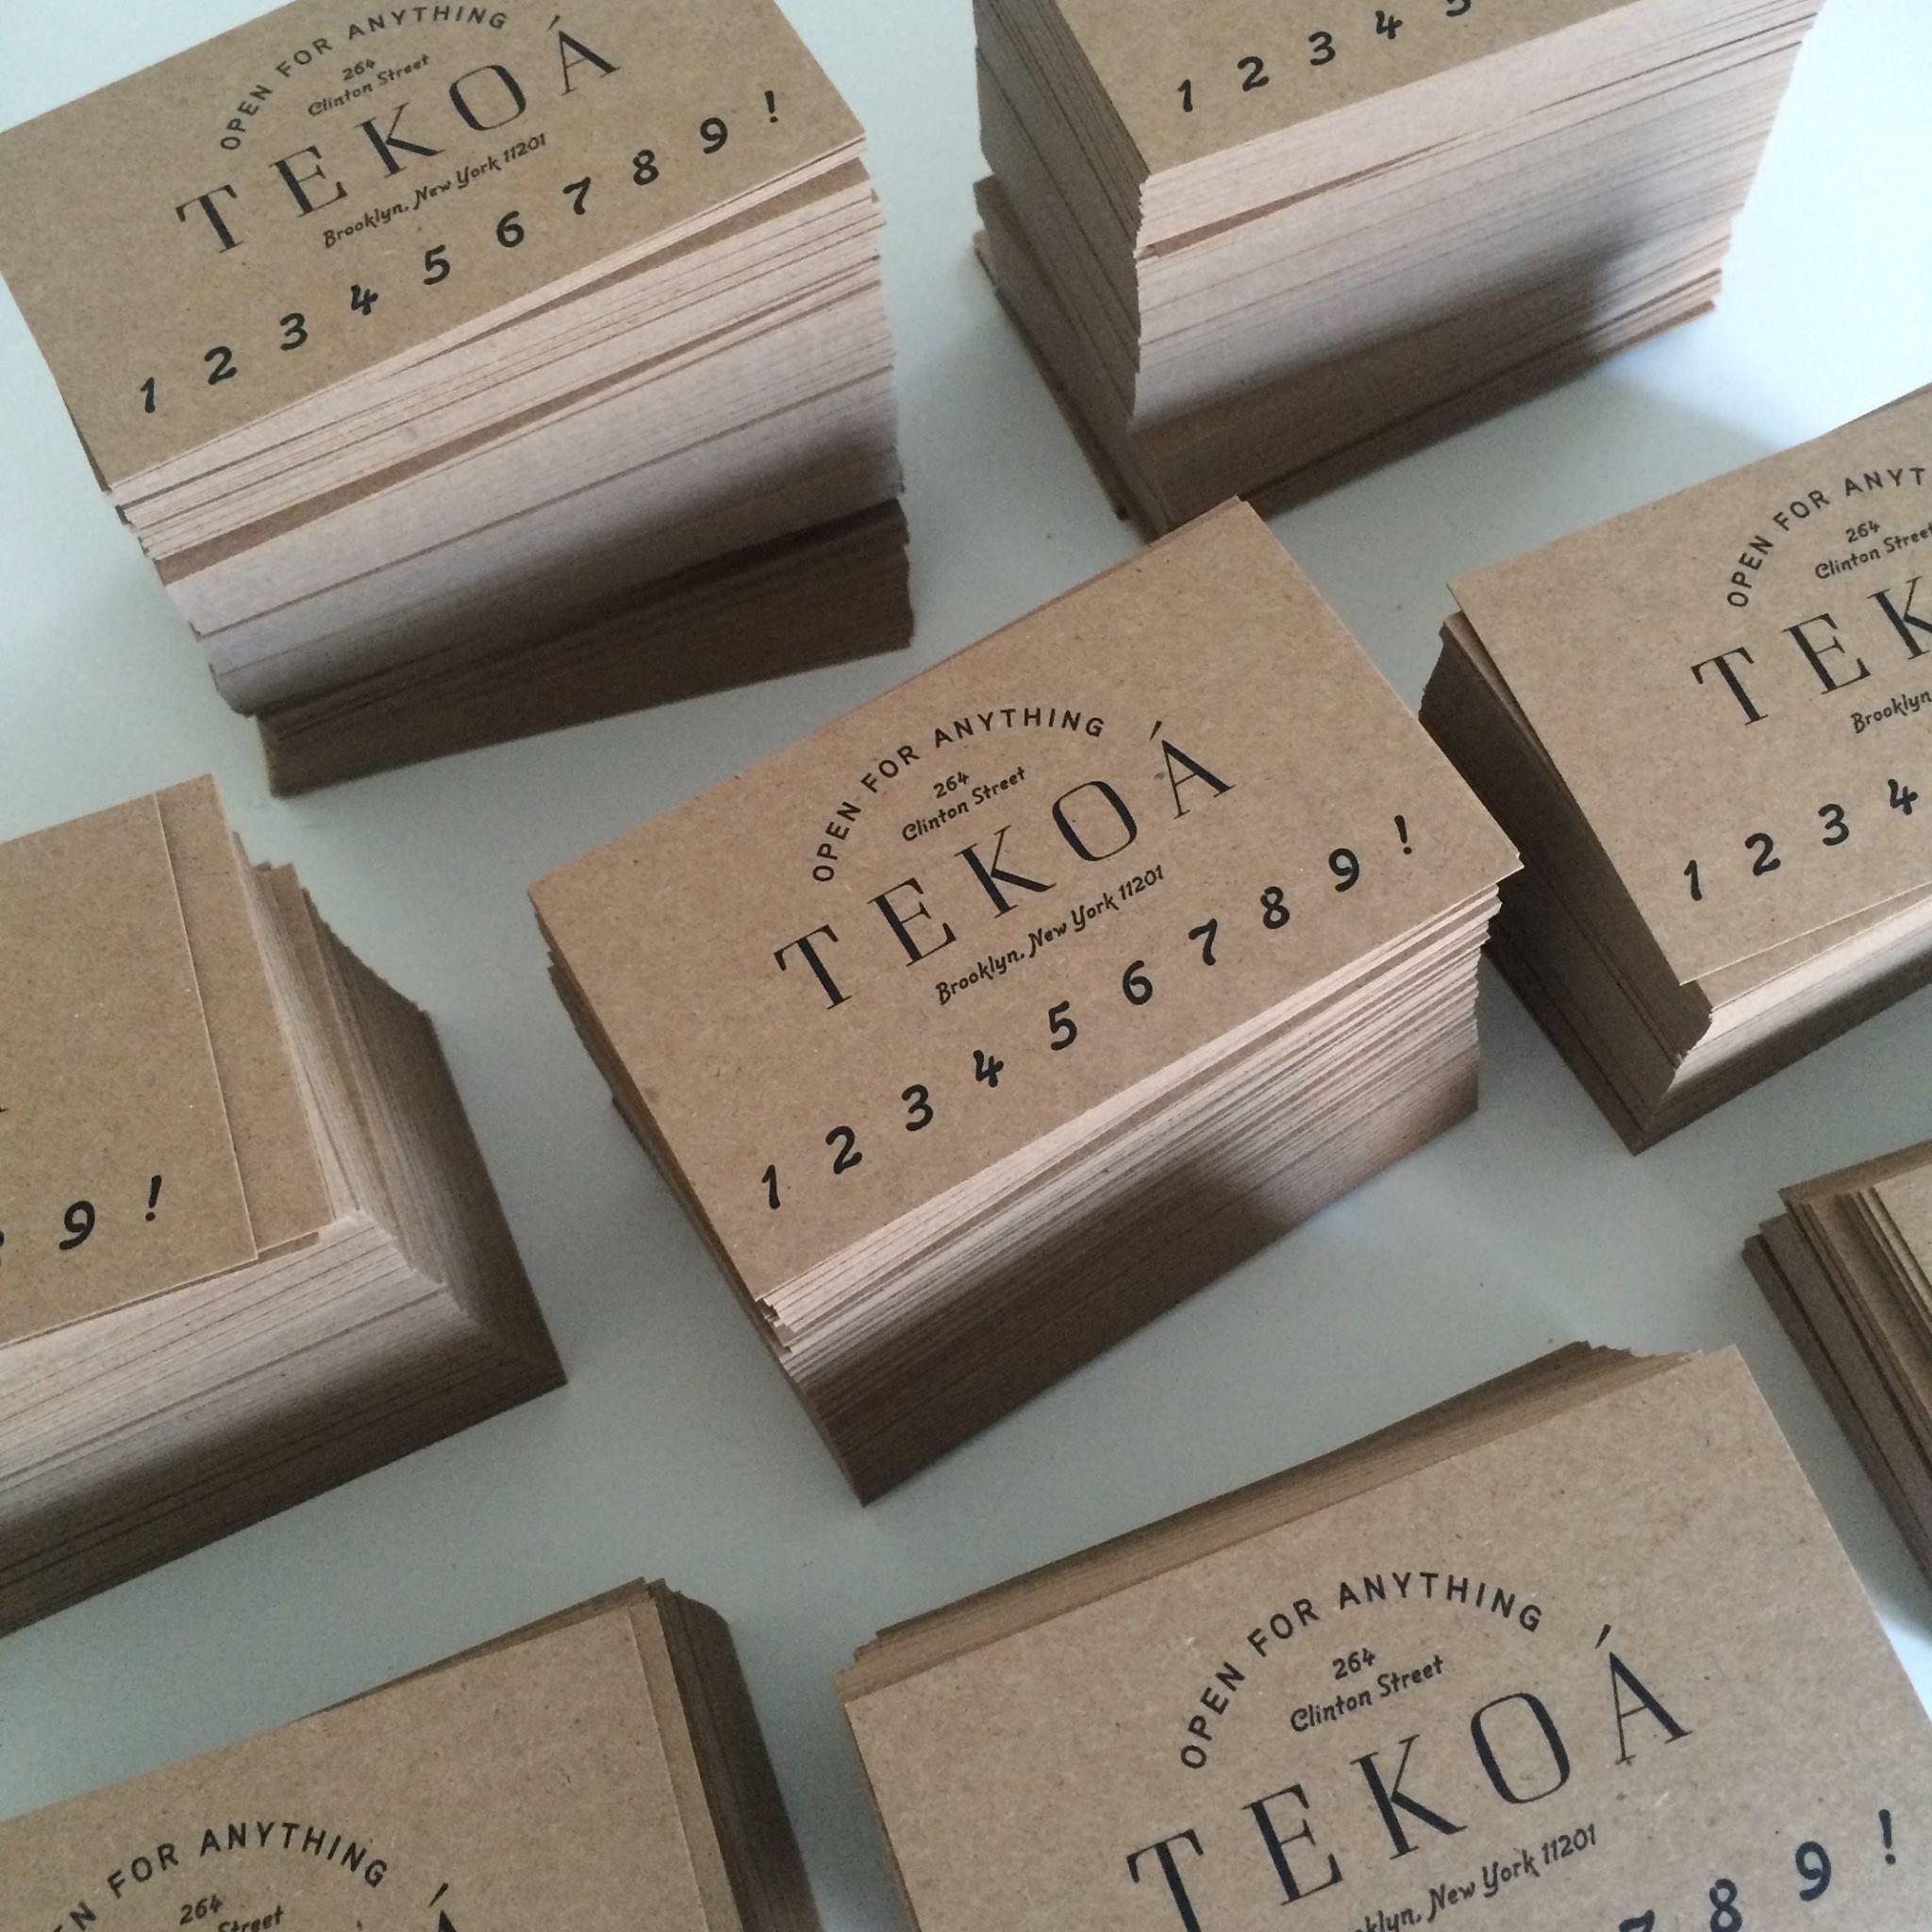 TEKOÁ's Promotional Business Card